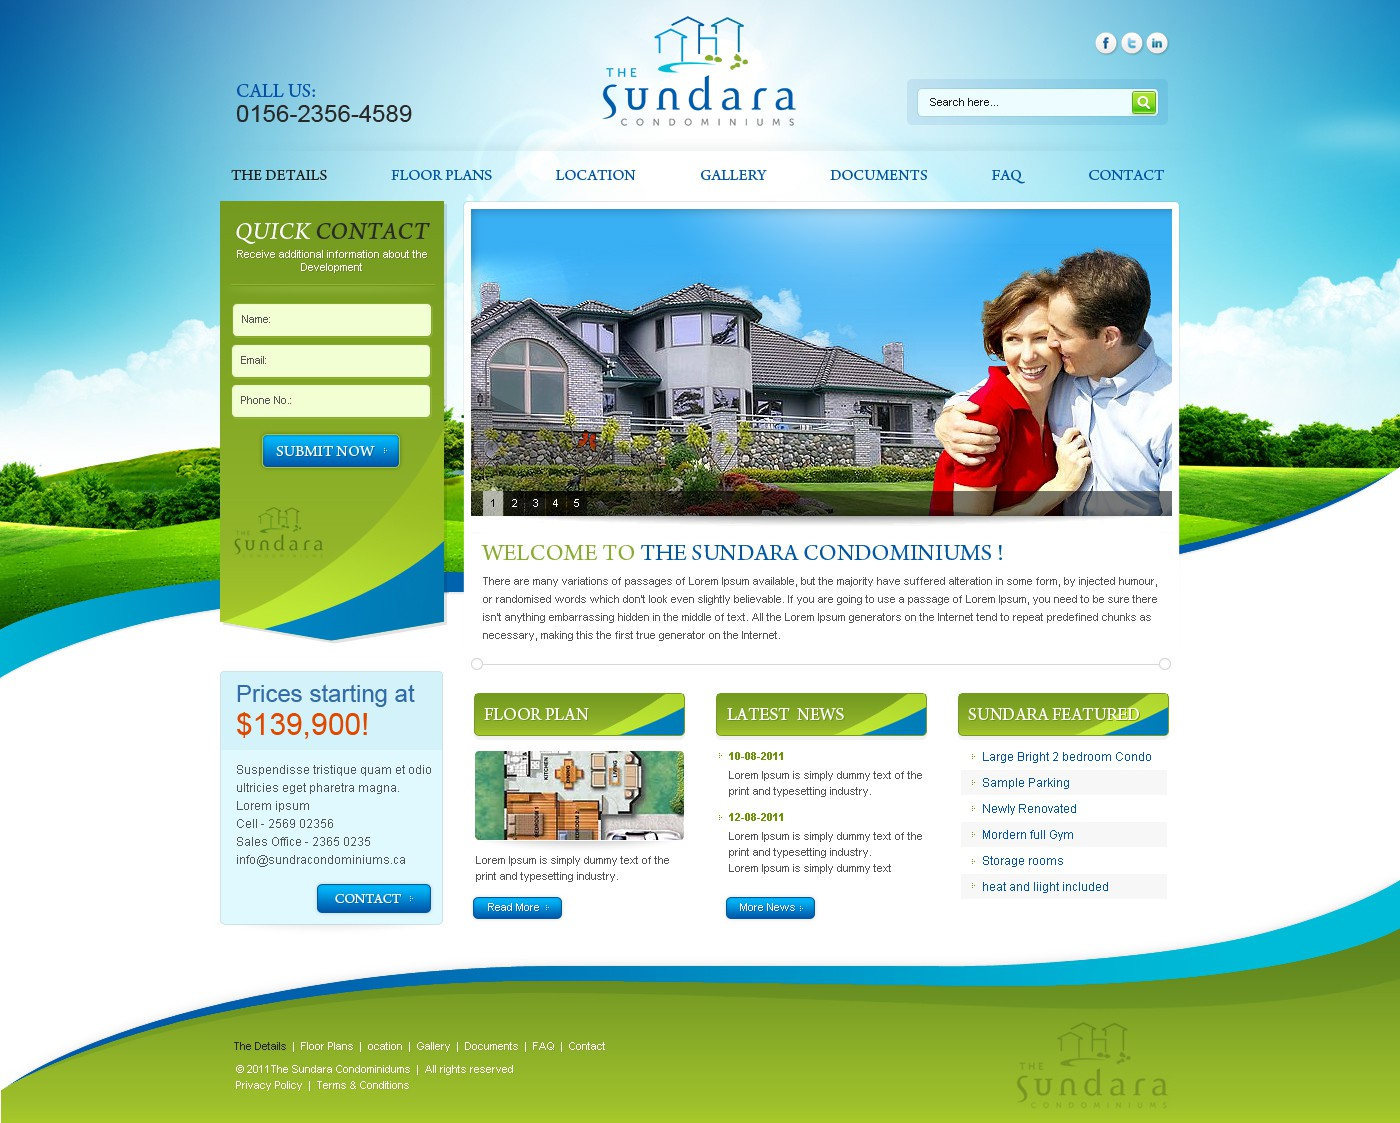 The Sundara Condominiums needs a new website design